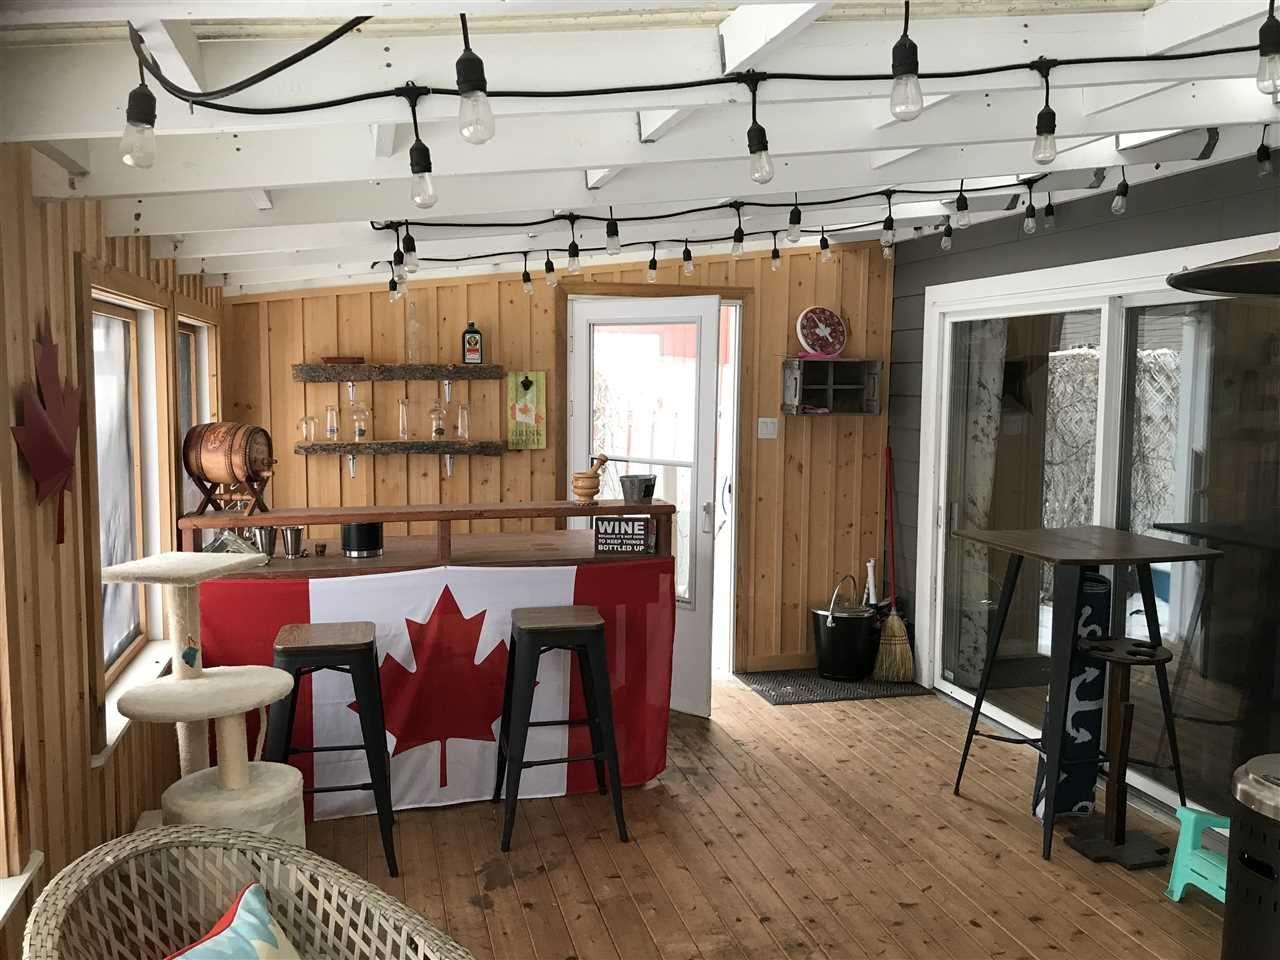 Photo 8: Photos: 10516 113 Avenue in Fort St. John: Fort St. John - City NW House for sale (Fort St. John (Zone 60))  : MLS®# R2535649